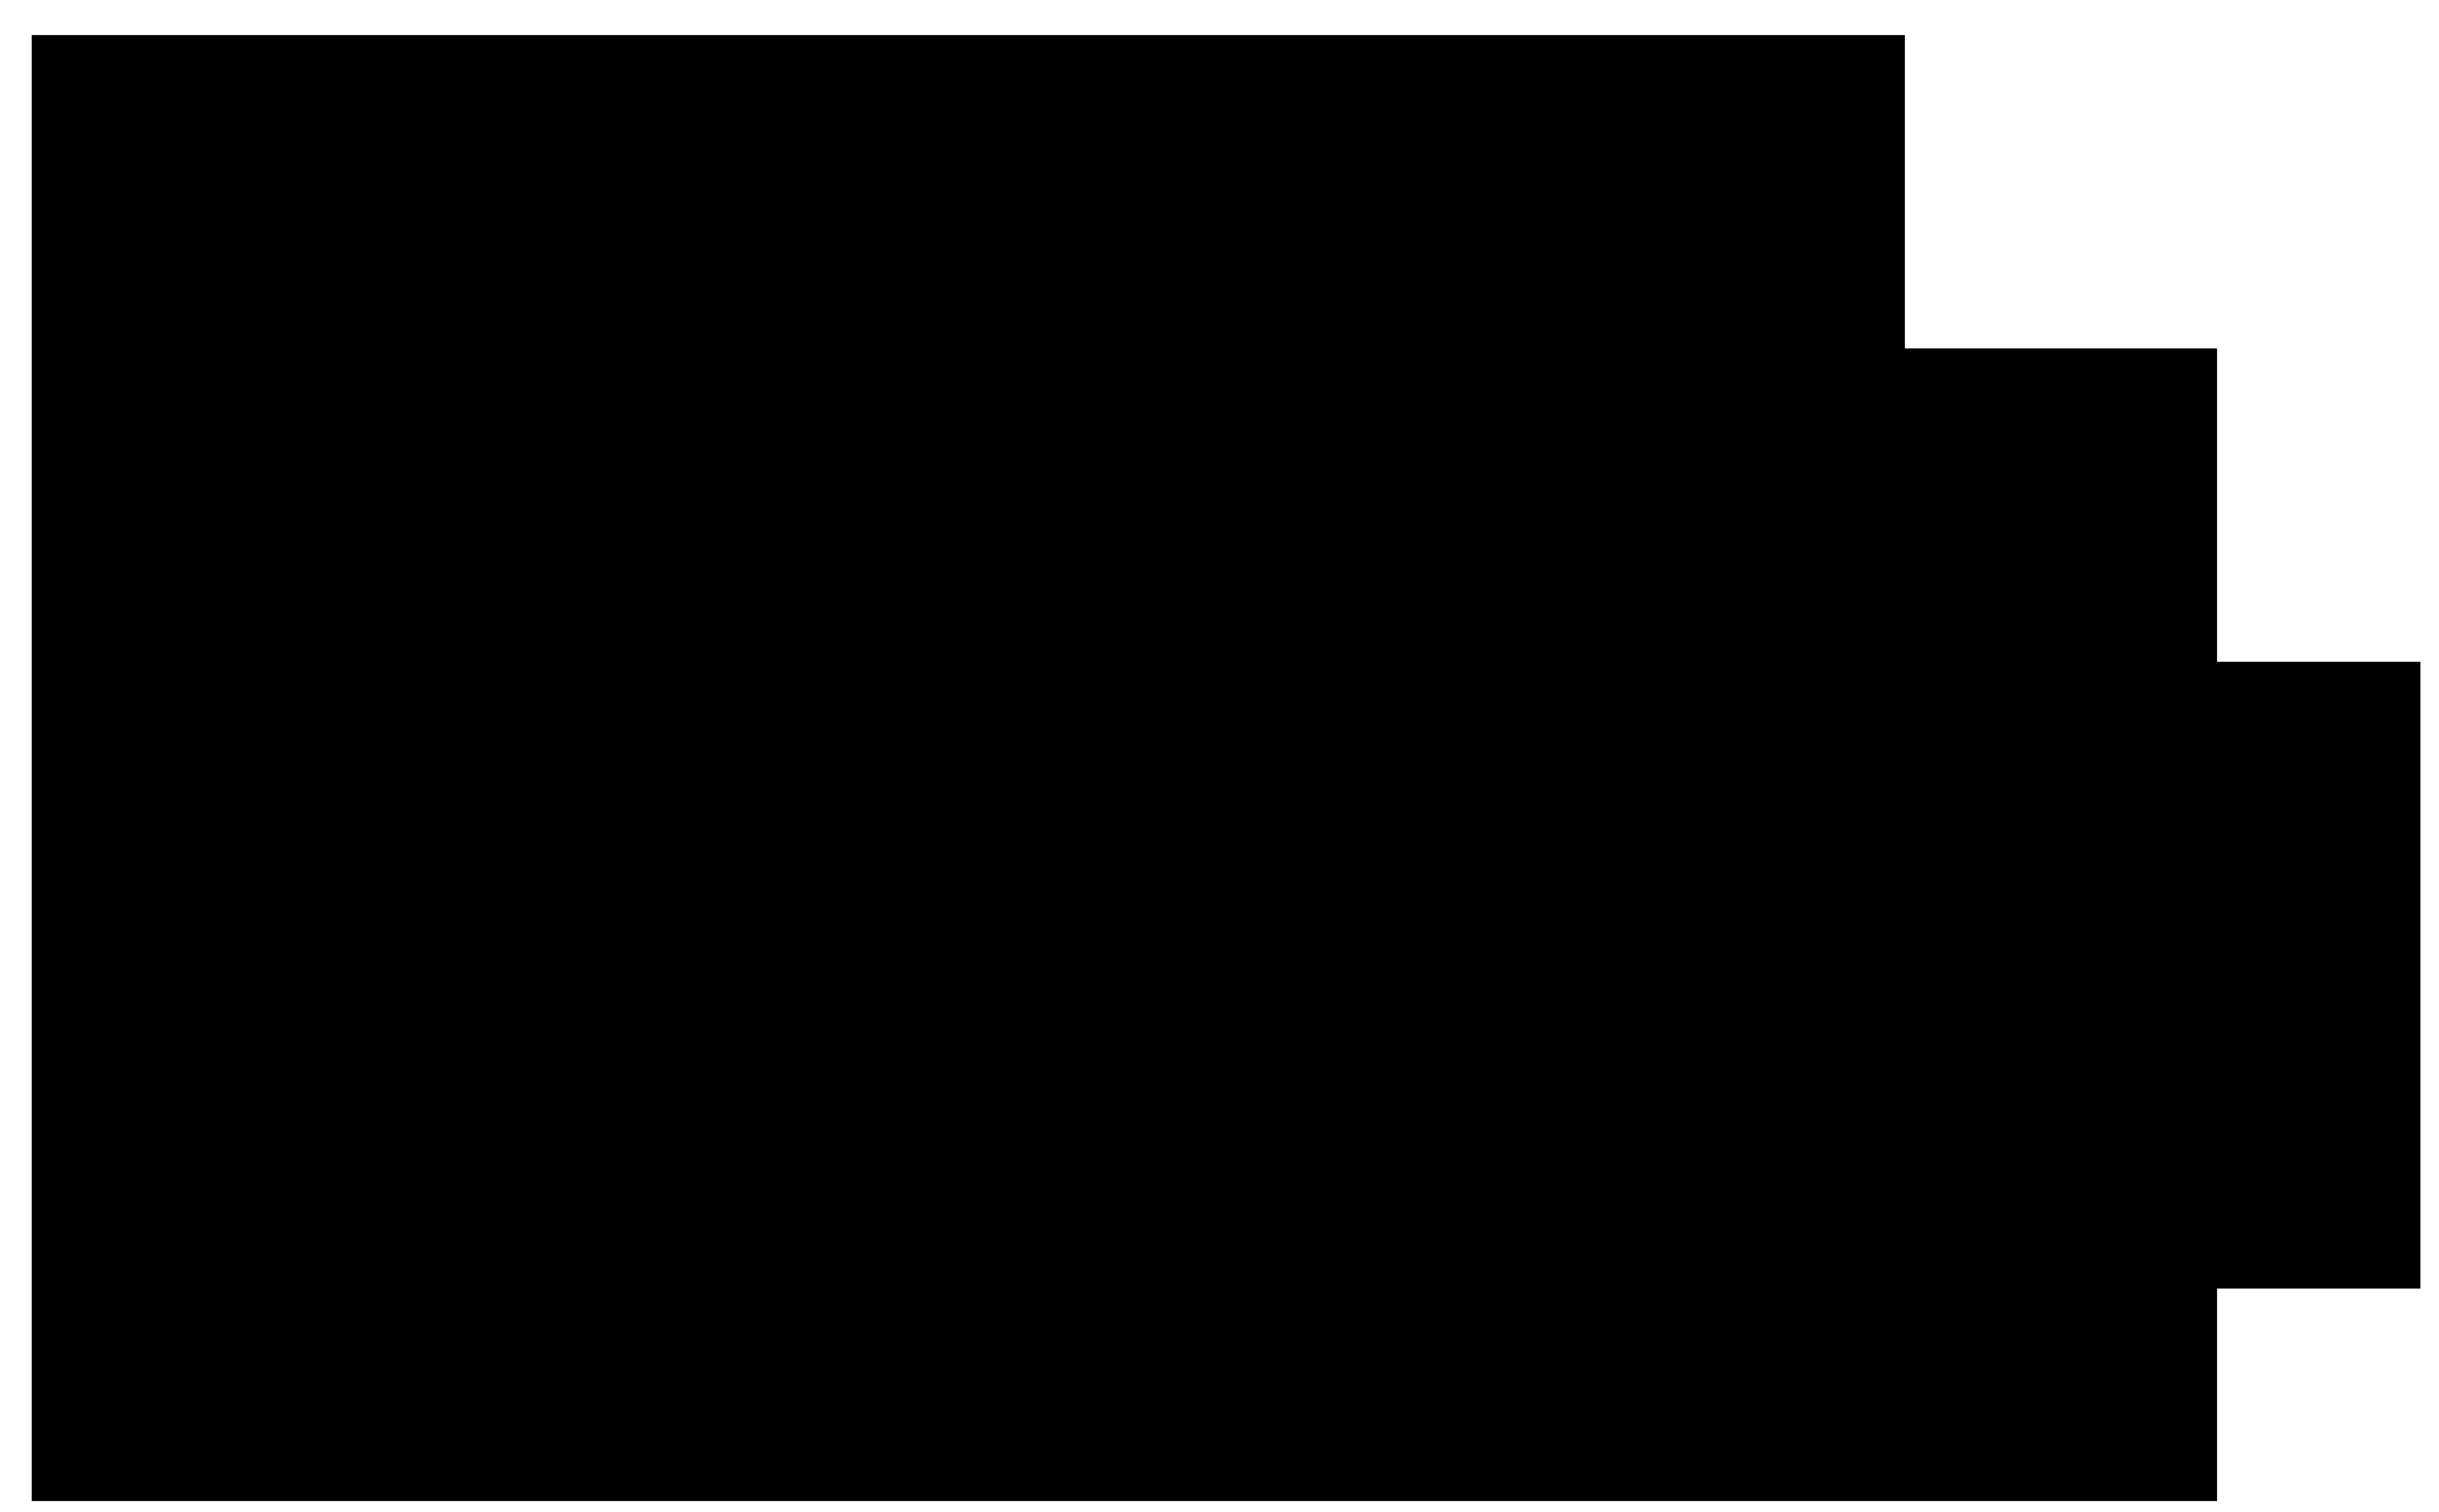 8000x4960 Lion Silhouette Png Clip Art Imageu200b Gallery Yopriceville